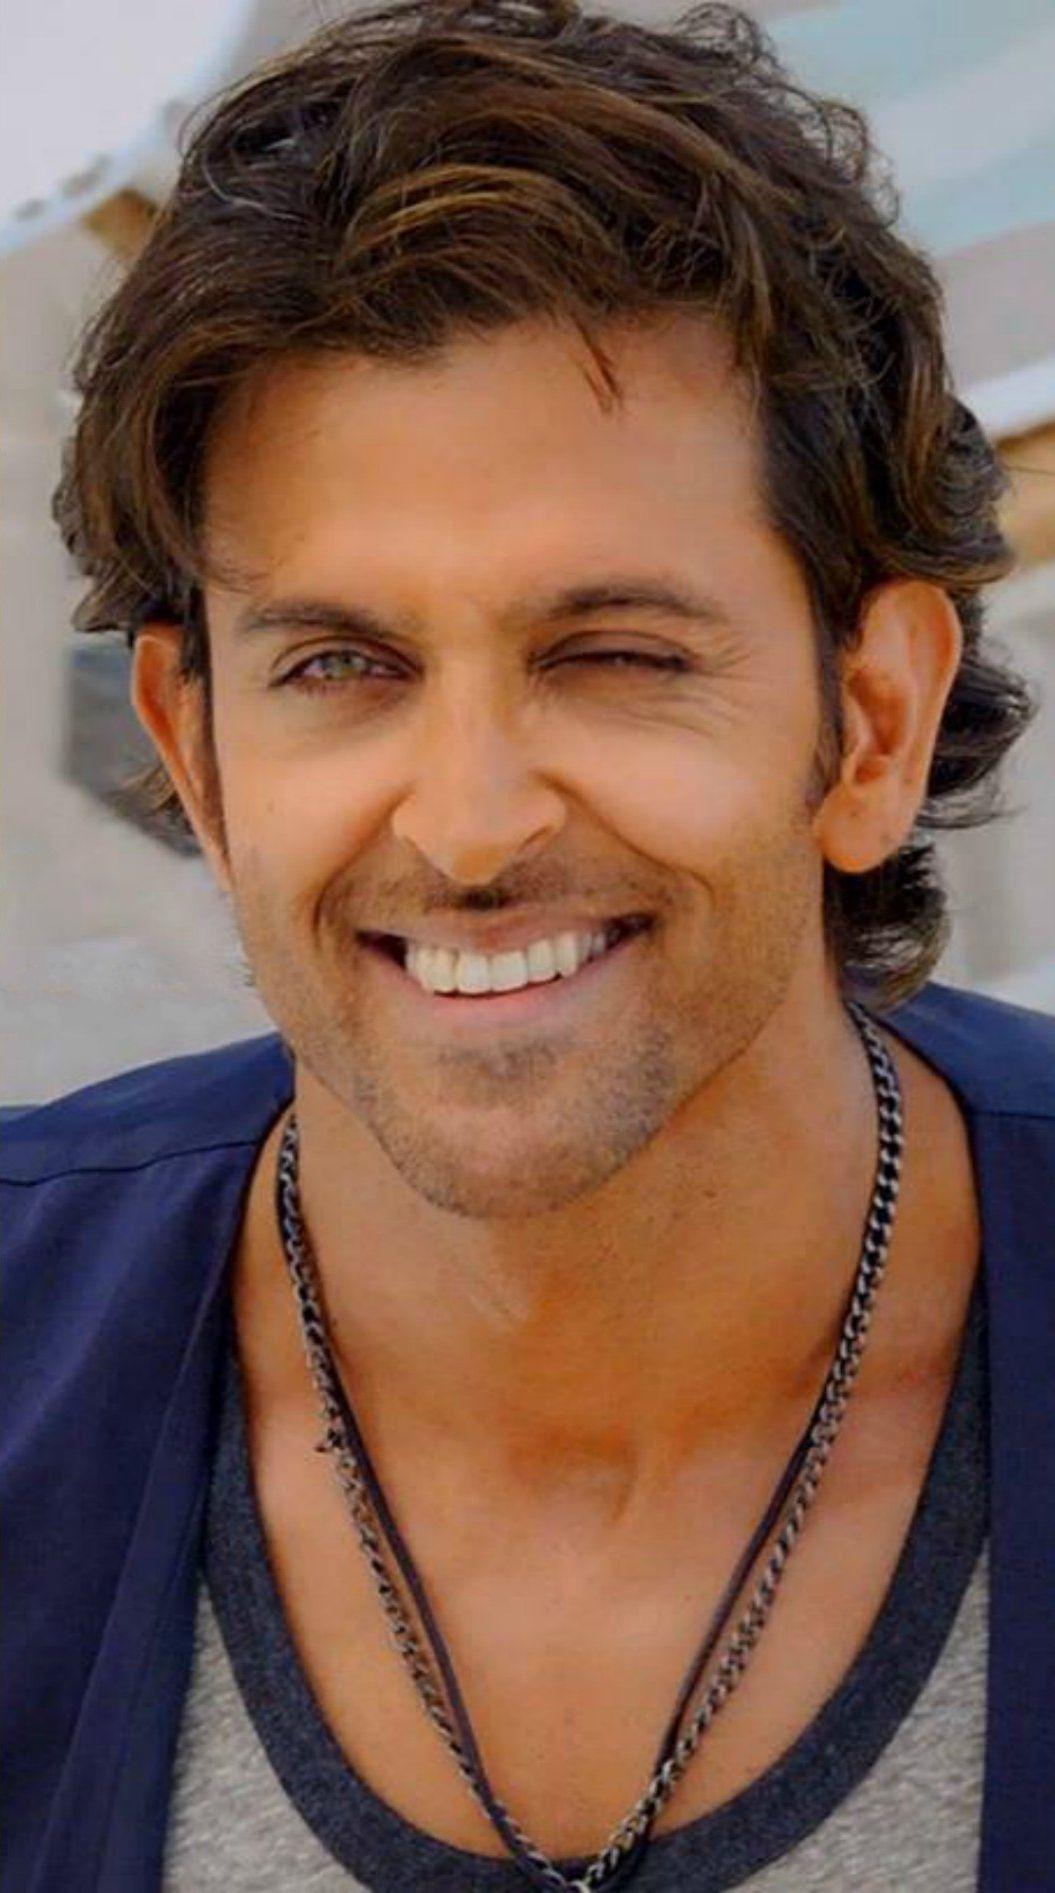 Hrithik Roshan Bighugs Kisseeesss Hrithik Roshan Hairstyle Hrithik Roshan Bollywood Pictures